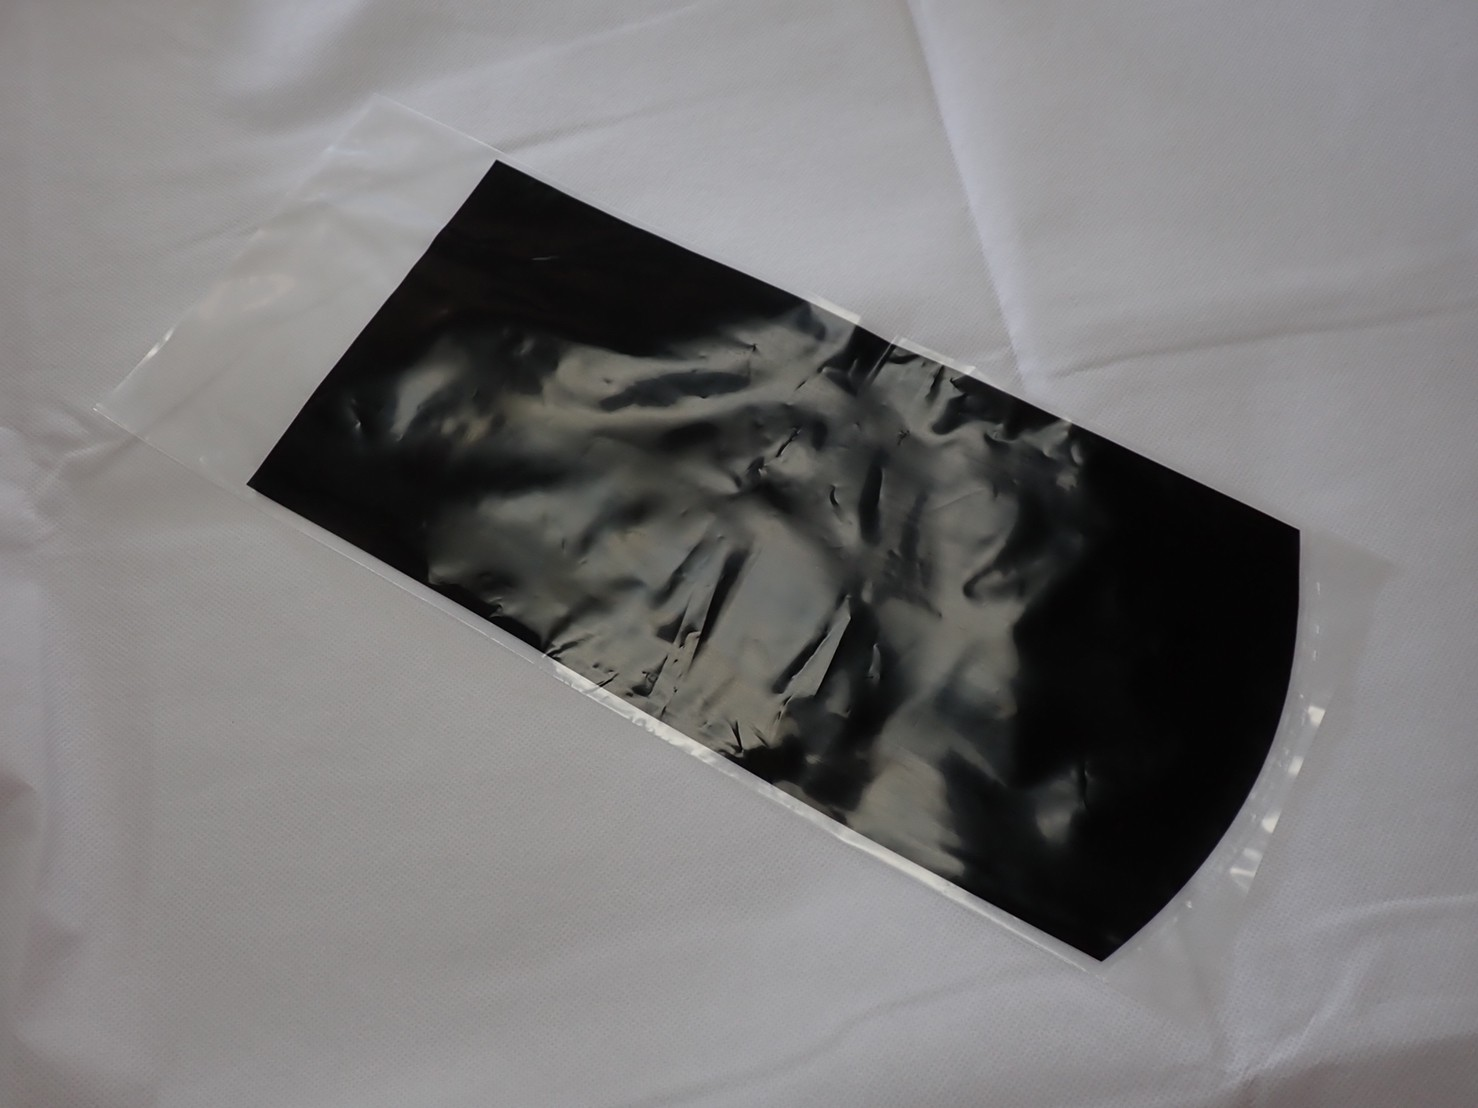 R-16B 片面黒印刷 NEW ARRIVAL 梱包用袋 10枚 マーケット パッキング袋 魚にストレスを与えない 丸底タイプ 色落ち防止 メダカ用発送袋 60サイズにピッタリ